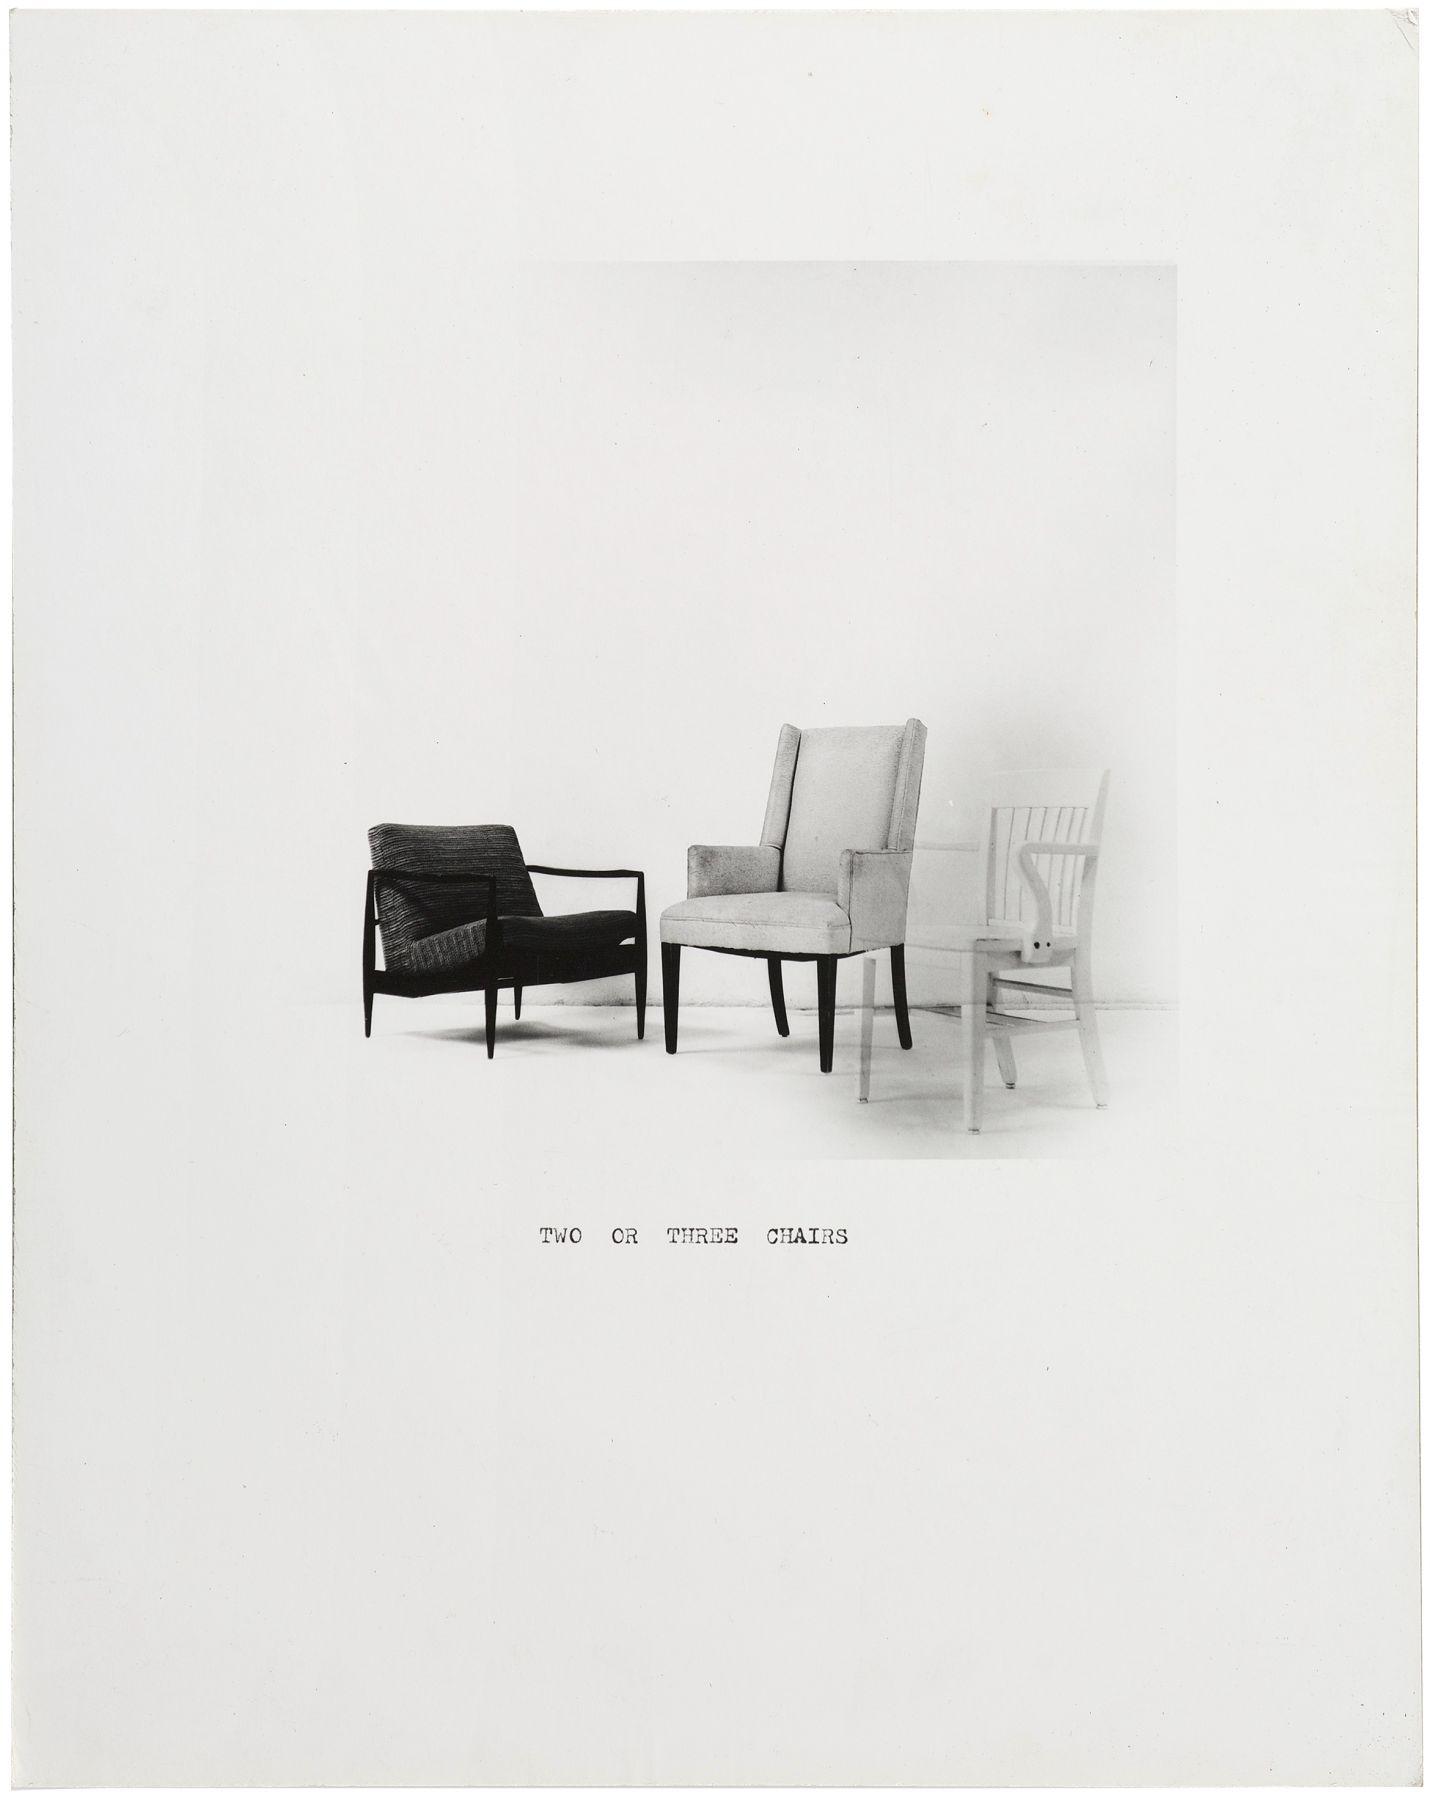 William Wegman,Two or Three Chairs,1972.